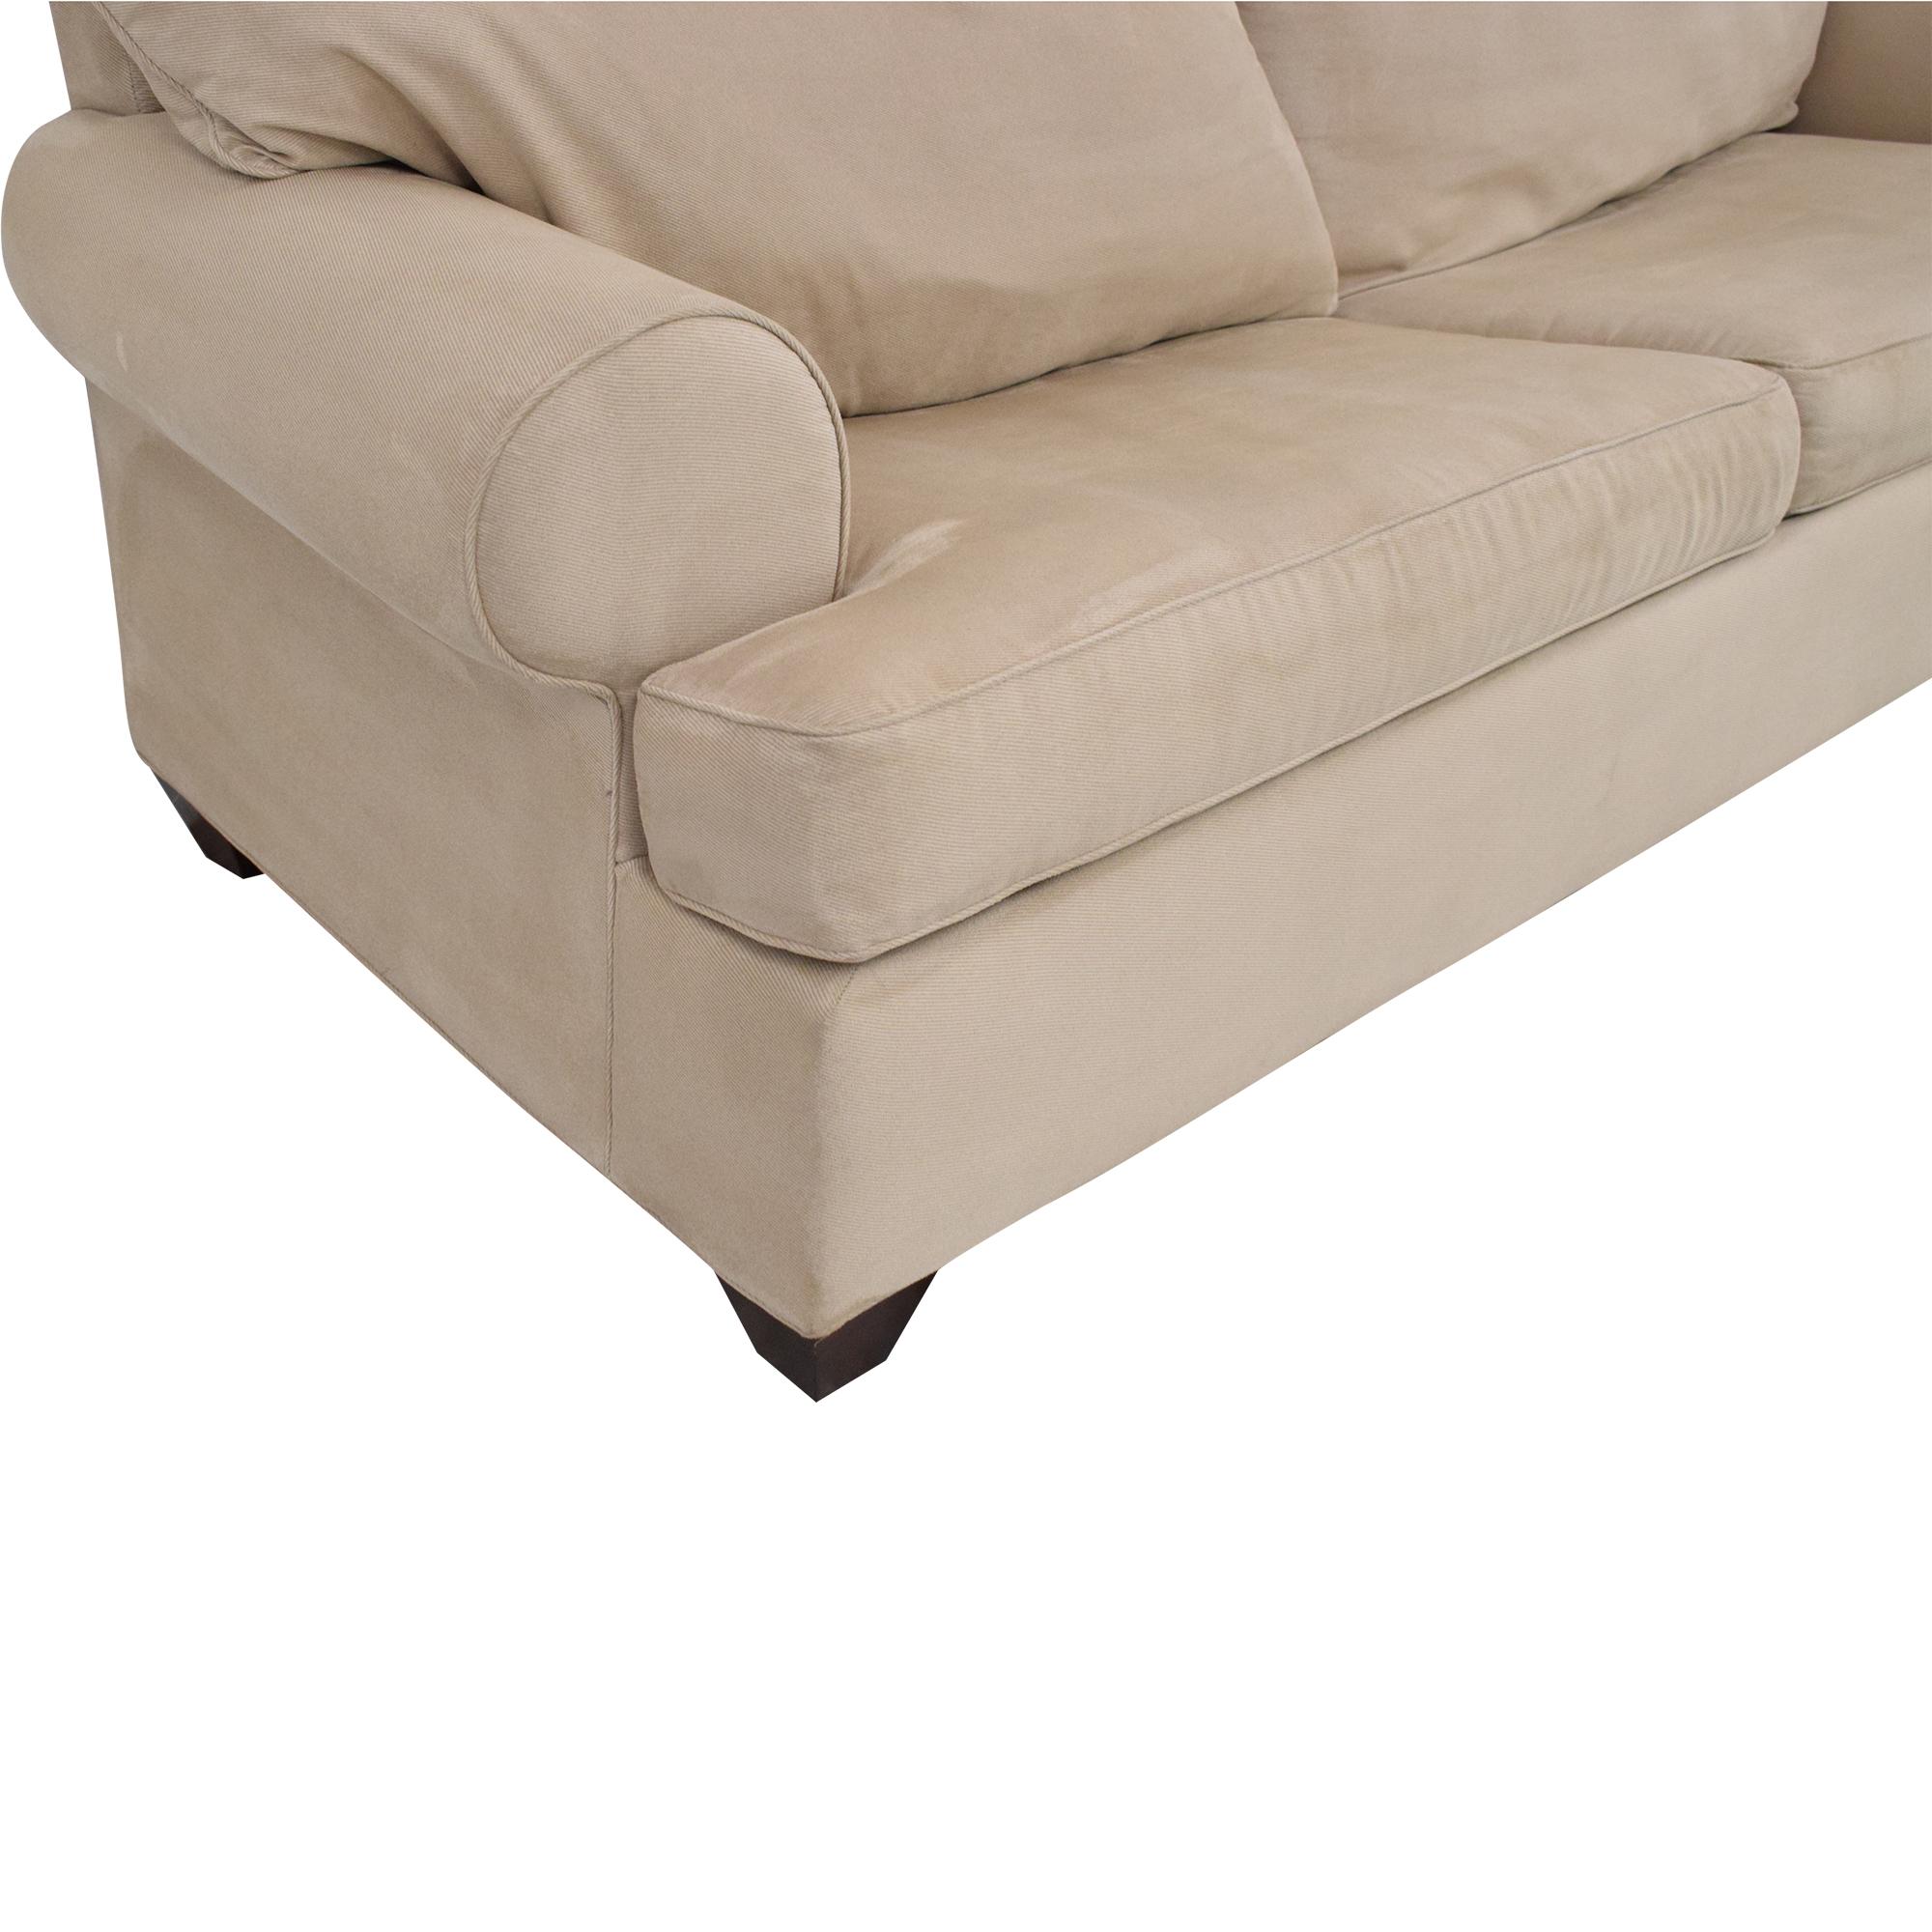 Raymour & Flanigan Raymour & Flanigan Sleeper Sofa used